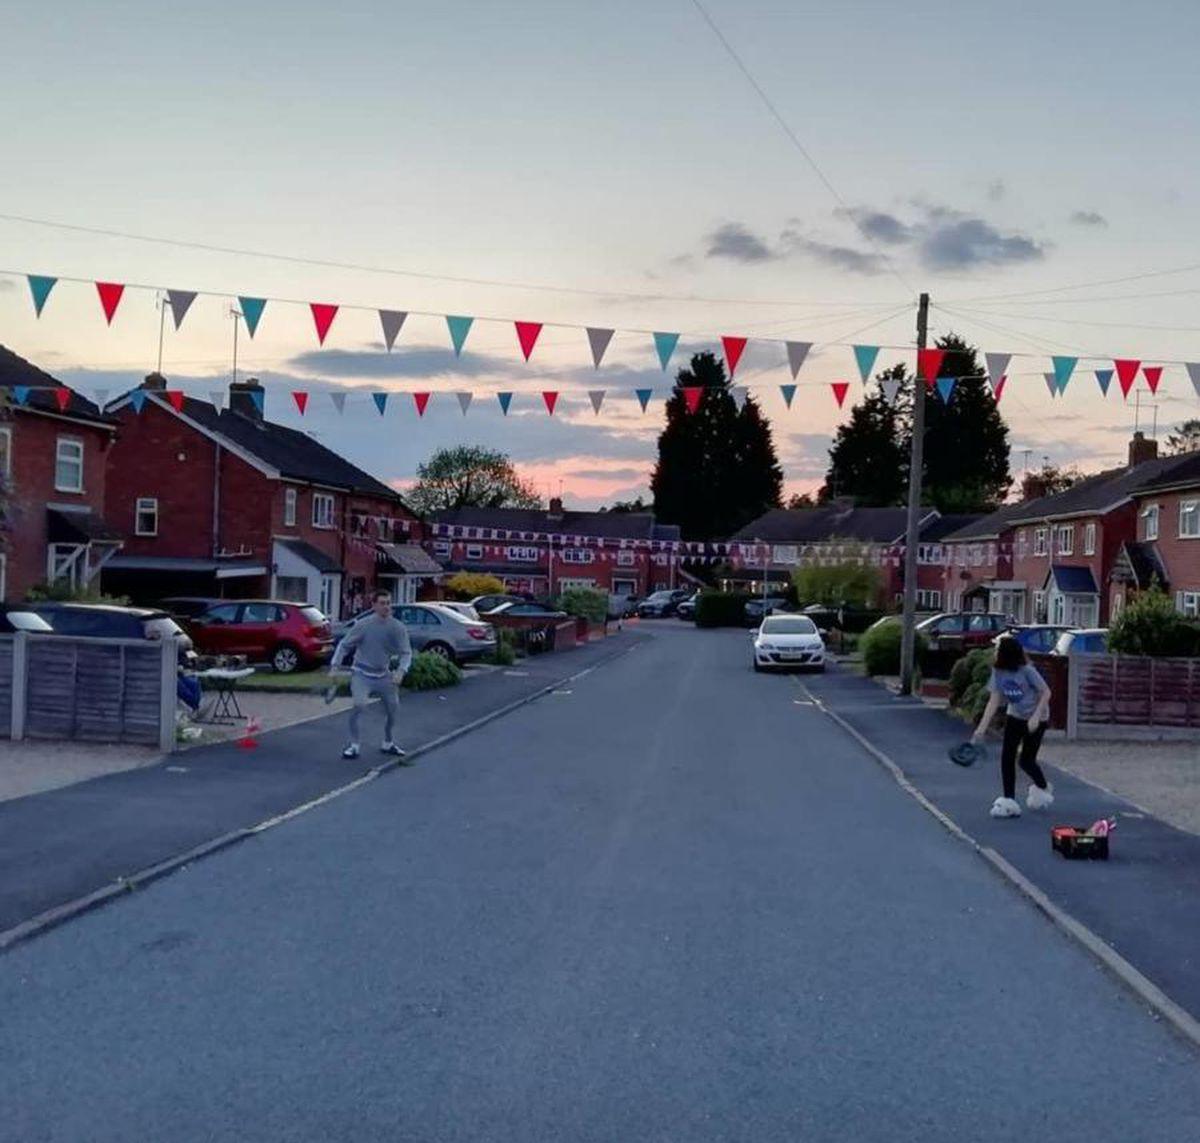 A street in Stourbridge celebrating VE Day